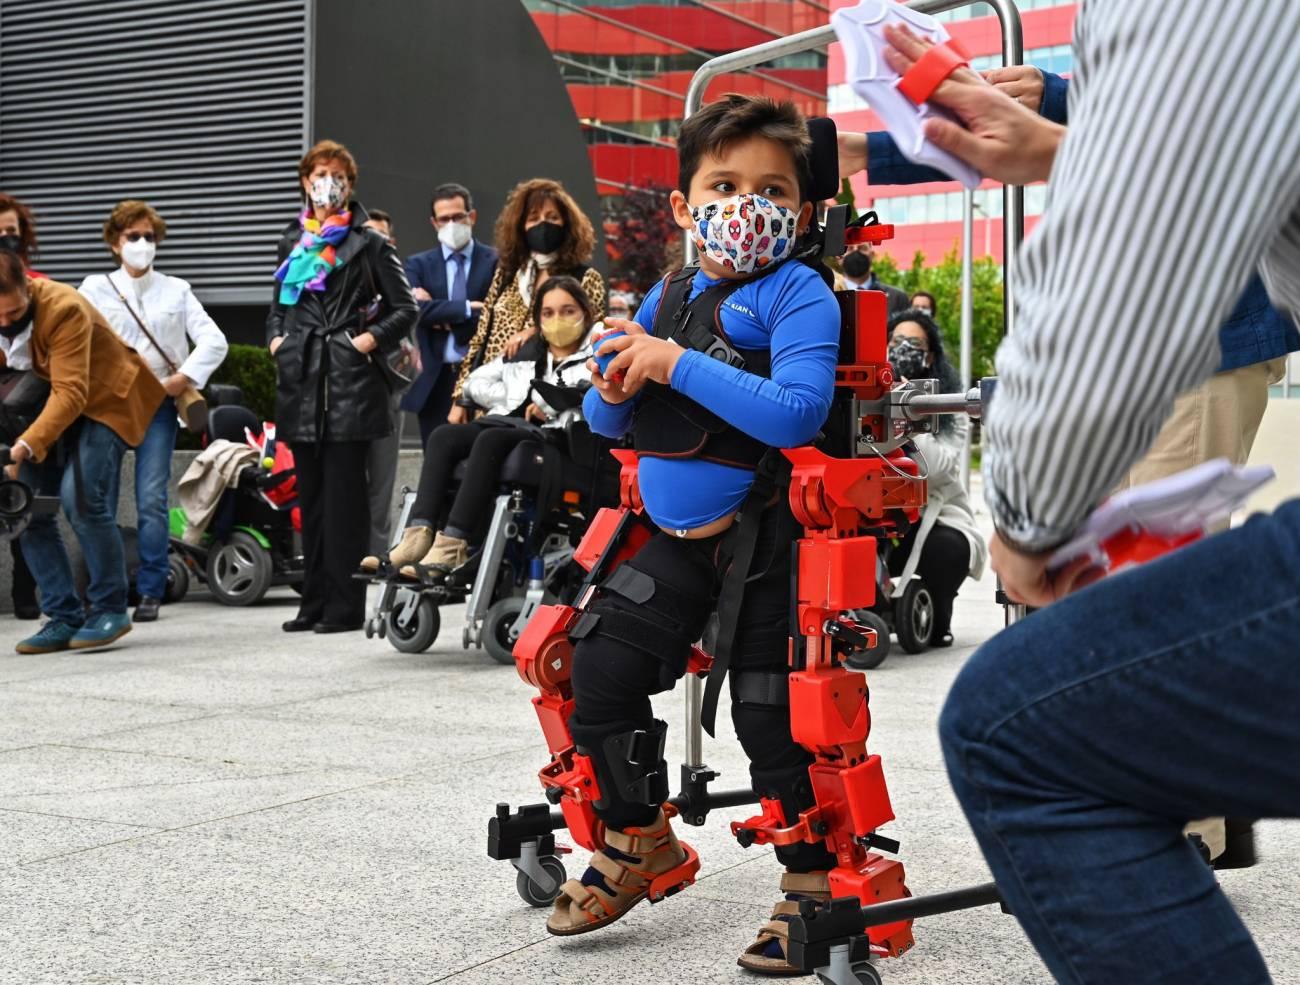 Demostración del exoesqueleto con un niño que padece atrofia muscular espinal. / CSIC